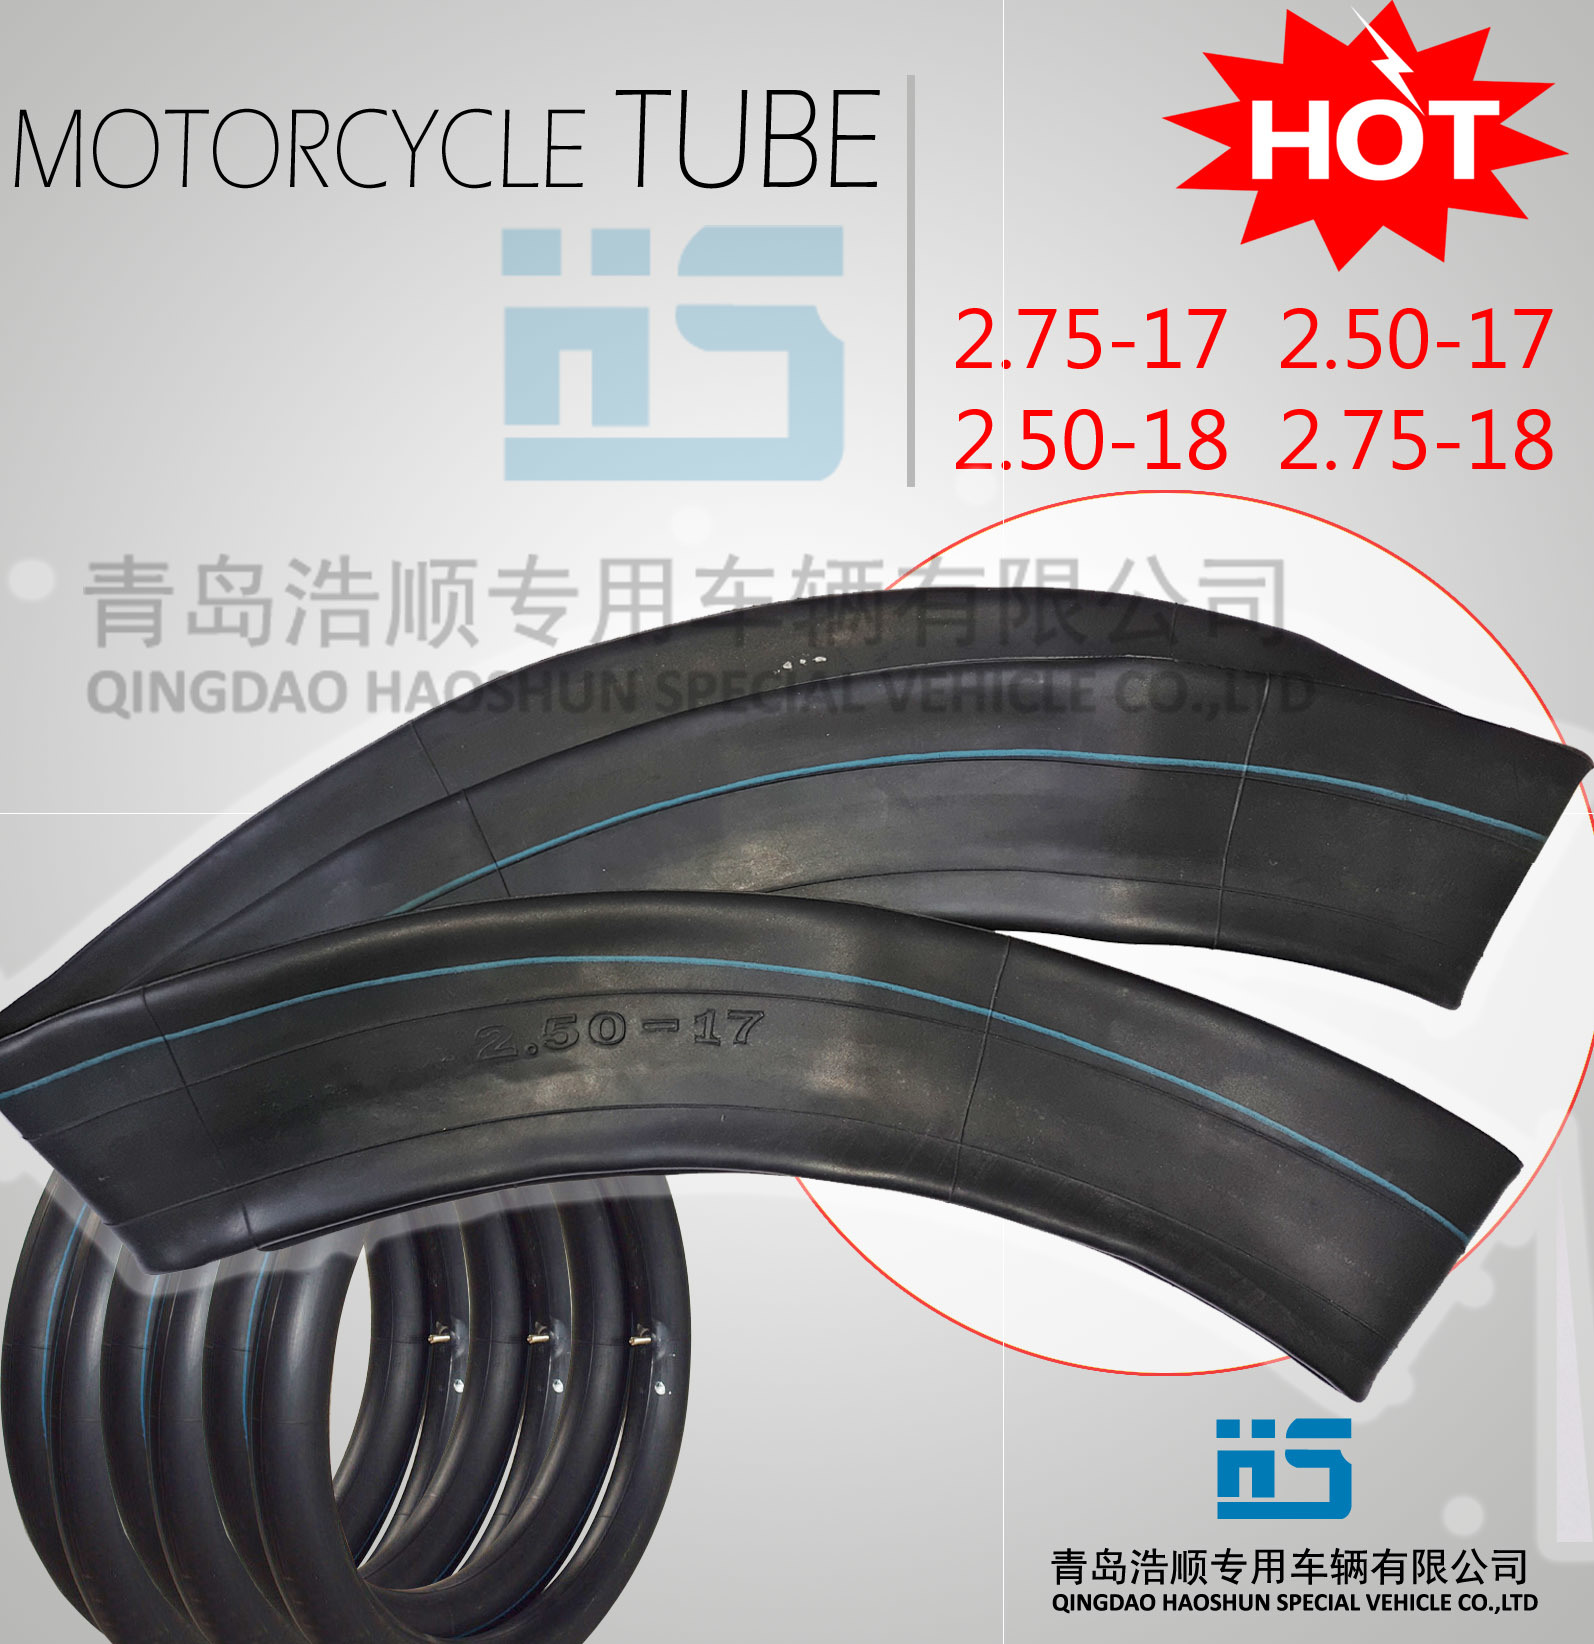 Motocicleta Motorcycle Tire Tyre Scooter Tire Keke Tyre Inner Tube ATV Tyre 2.75-17